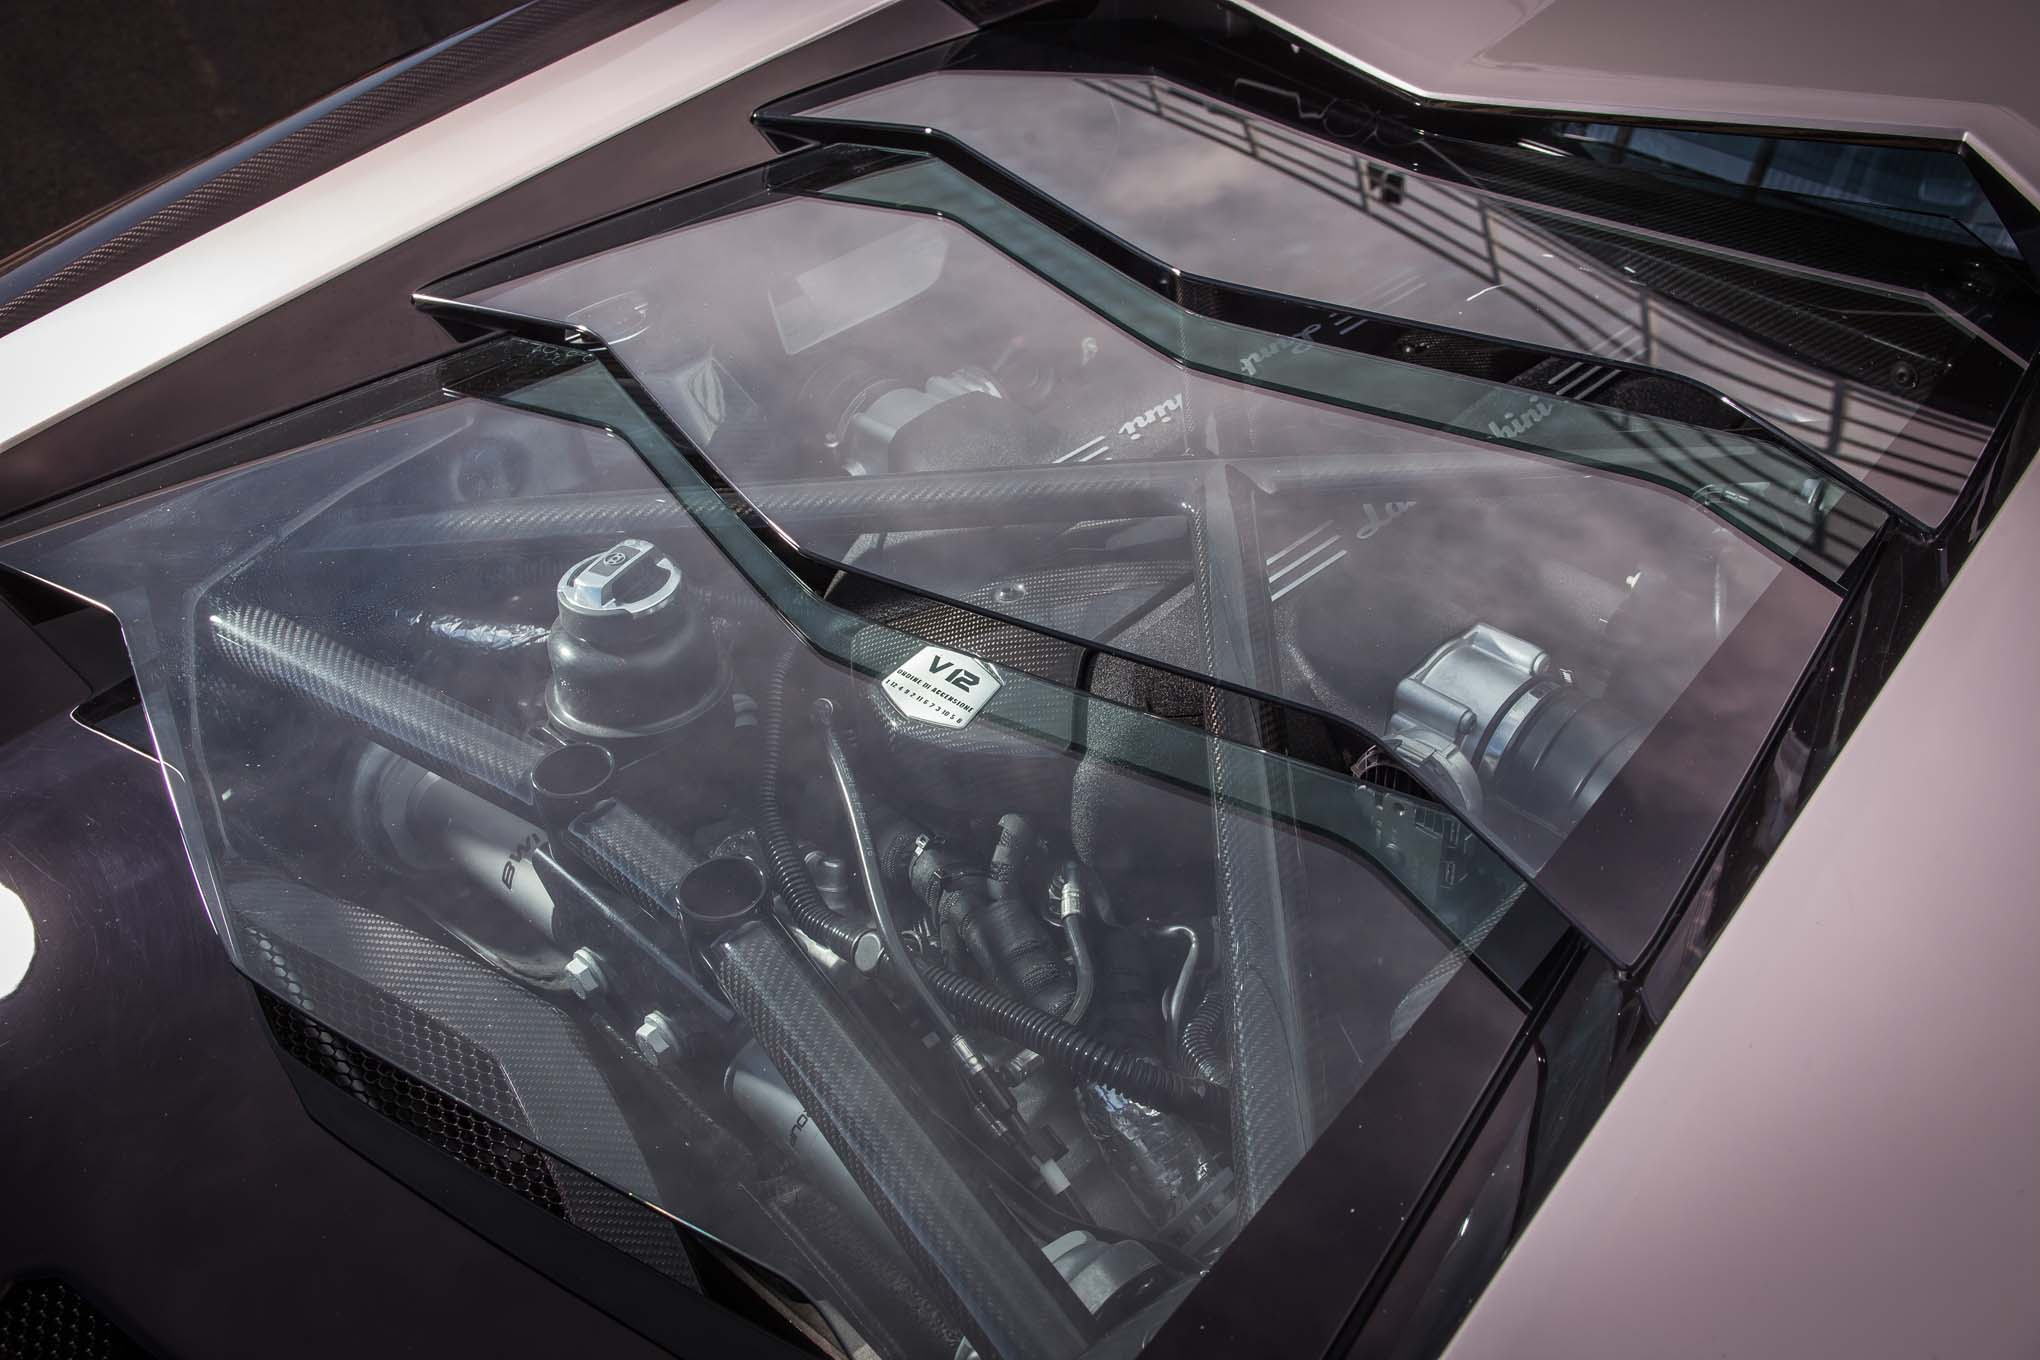 2018 Lamborghini Aventador S engine view